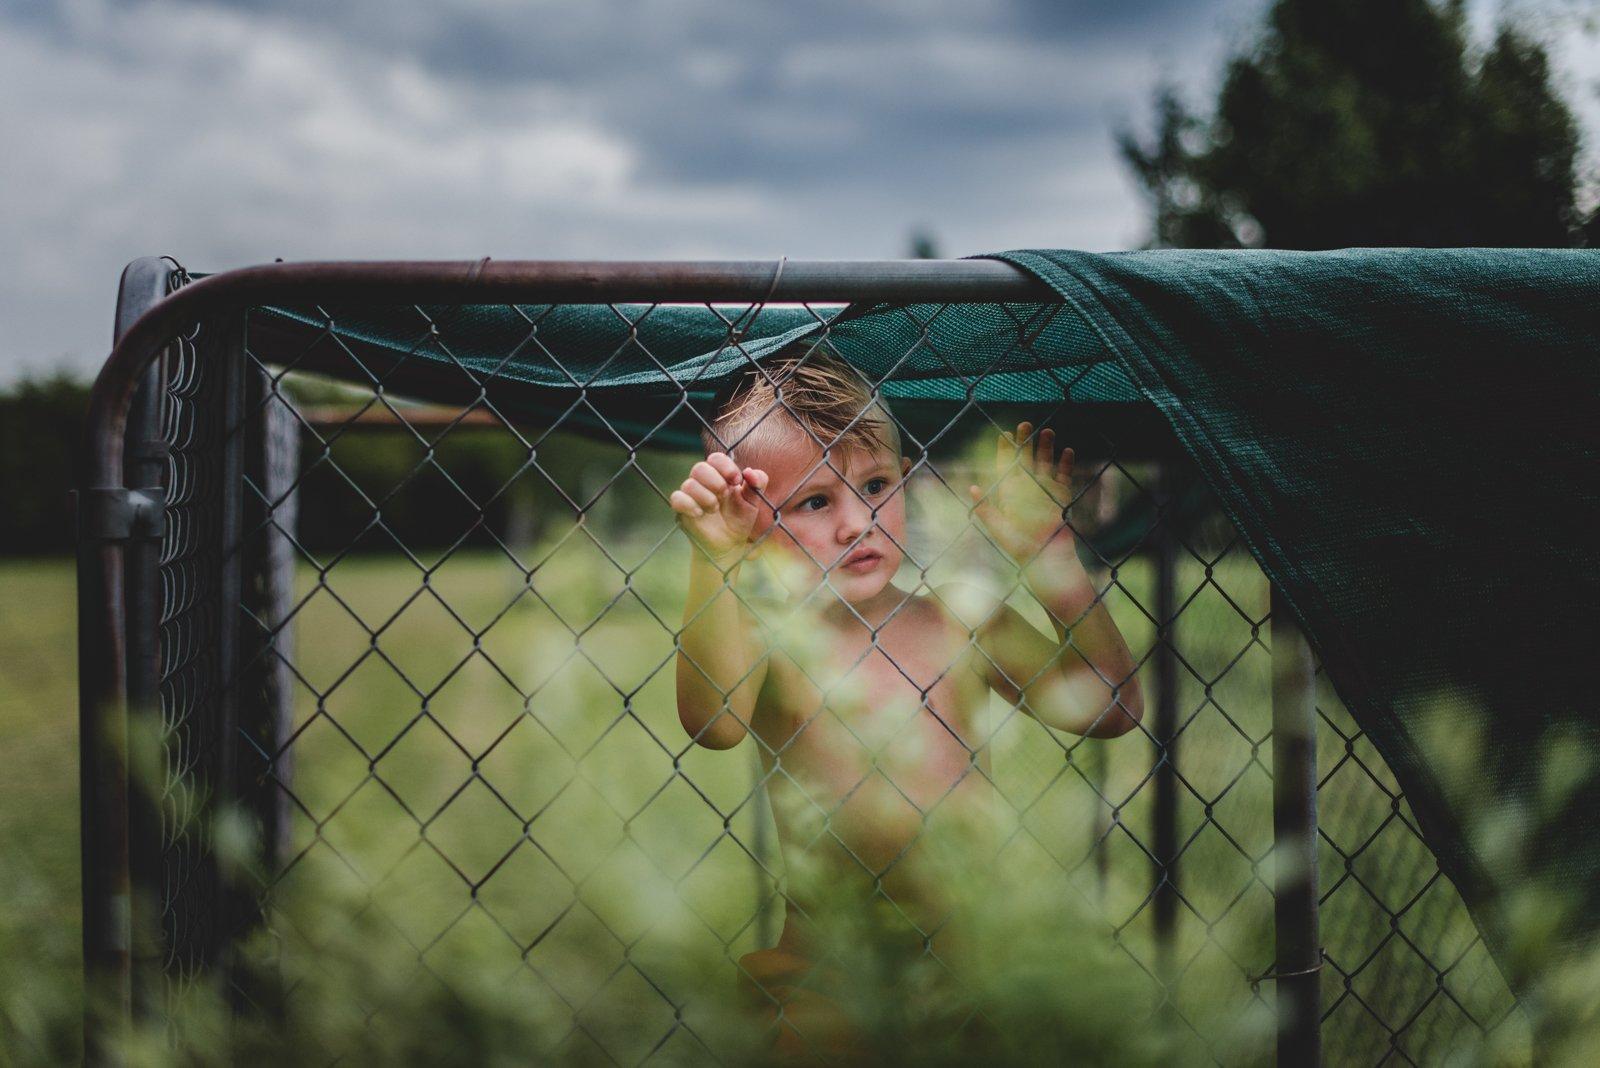 boy-standing-at-fence-natalie-greenroyd-50mm-lens